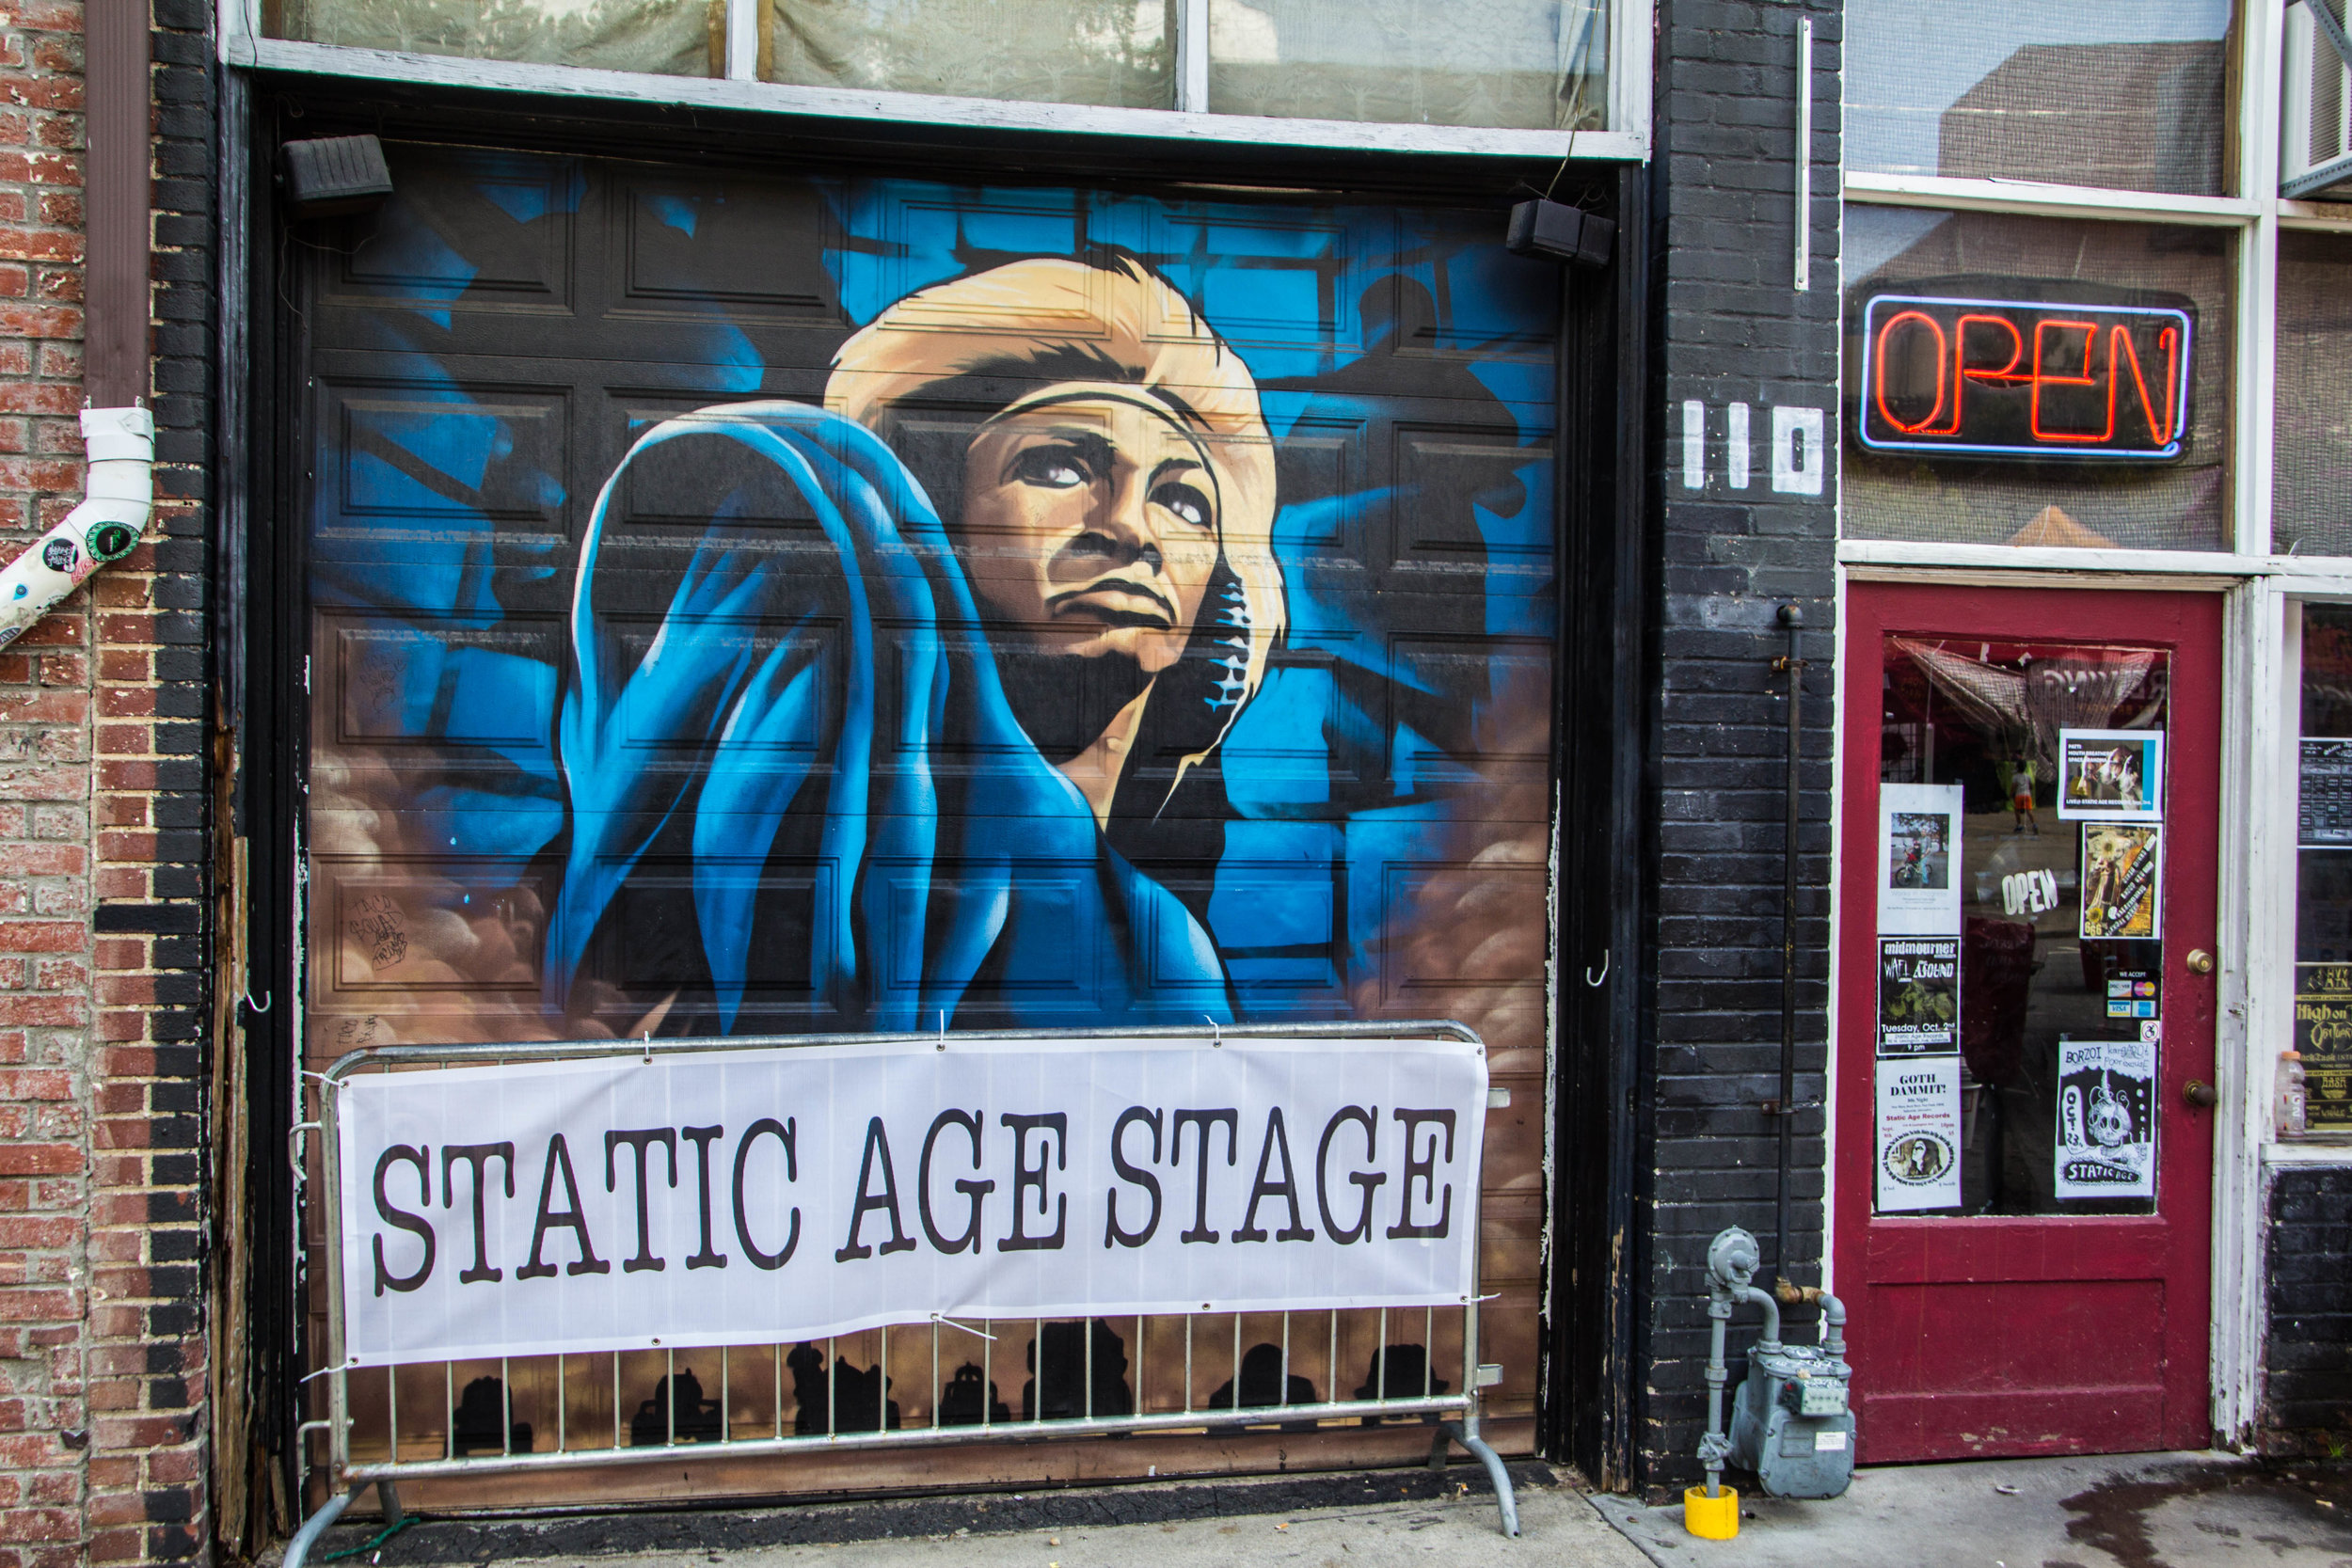 street-art-asheville-north-carolina-10.jpg